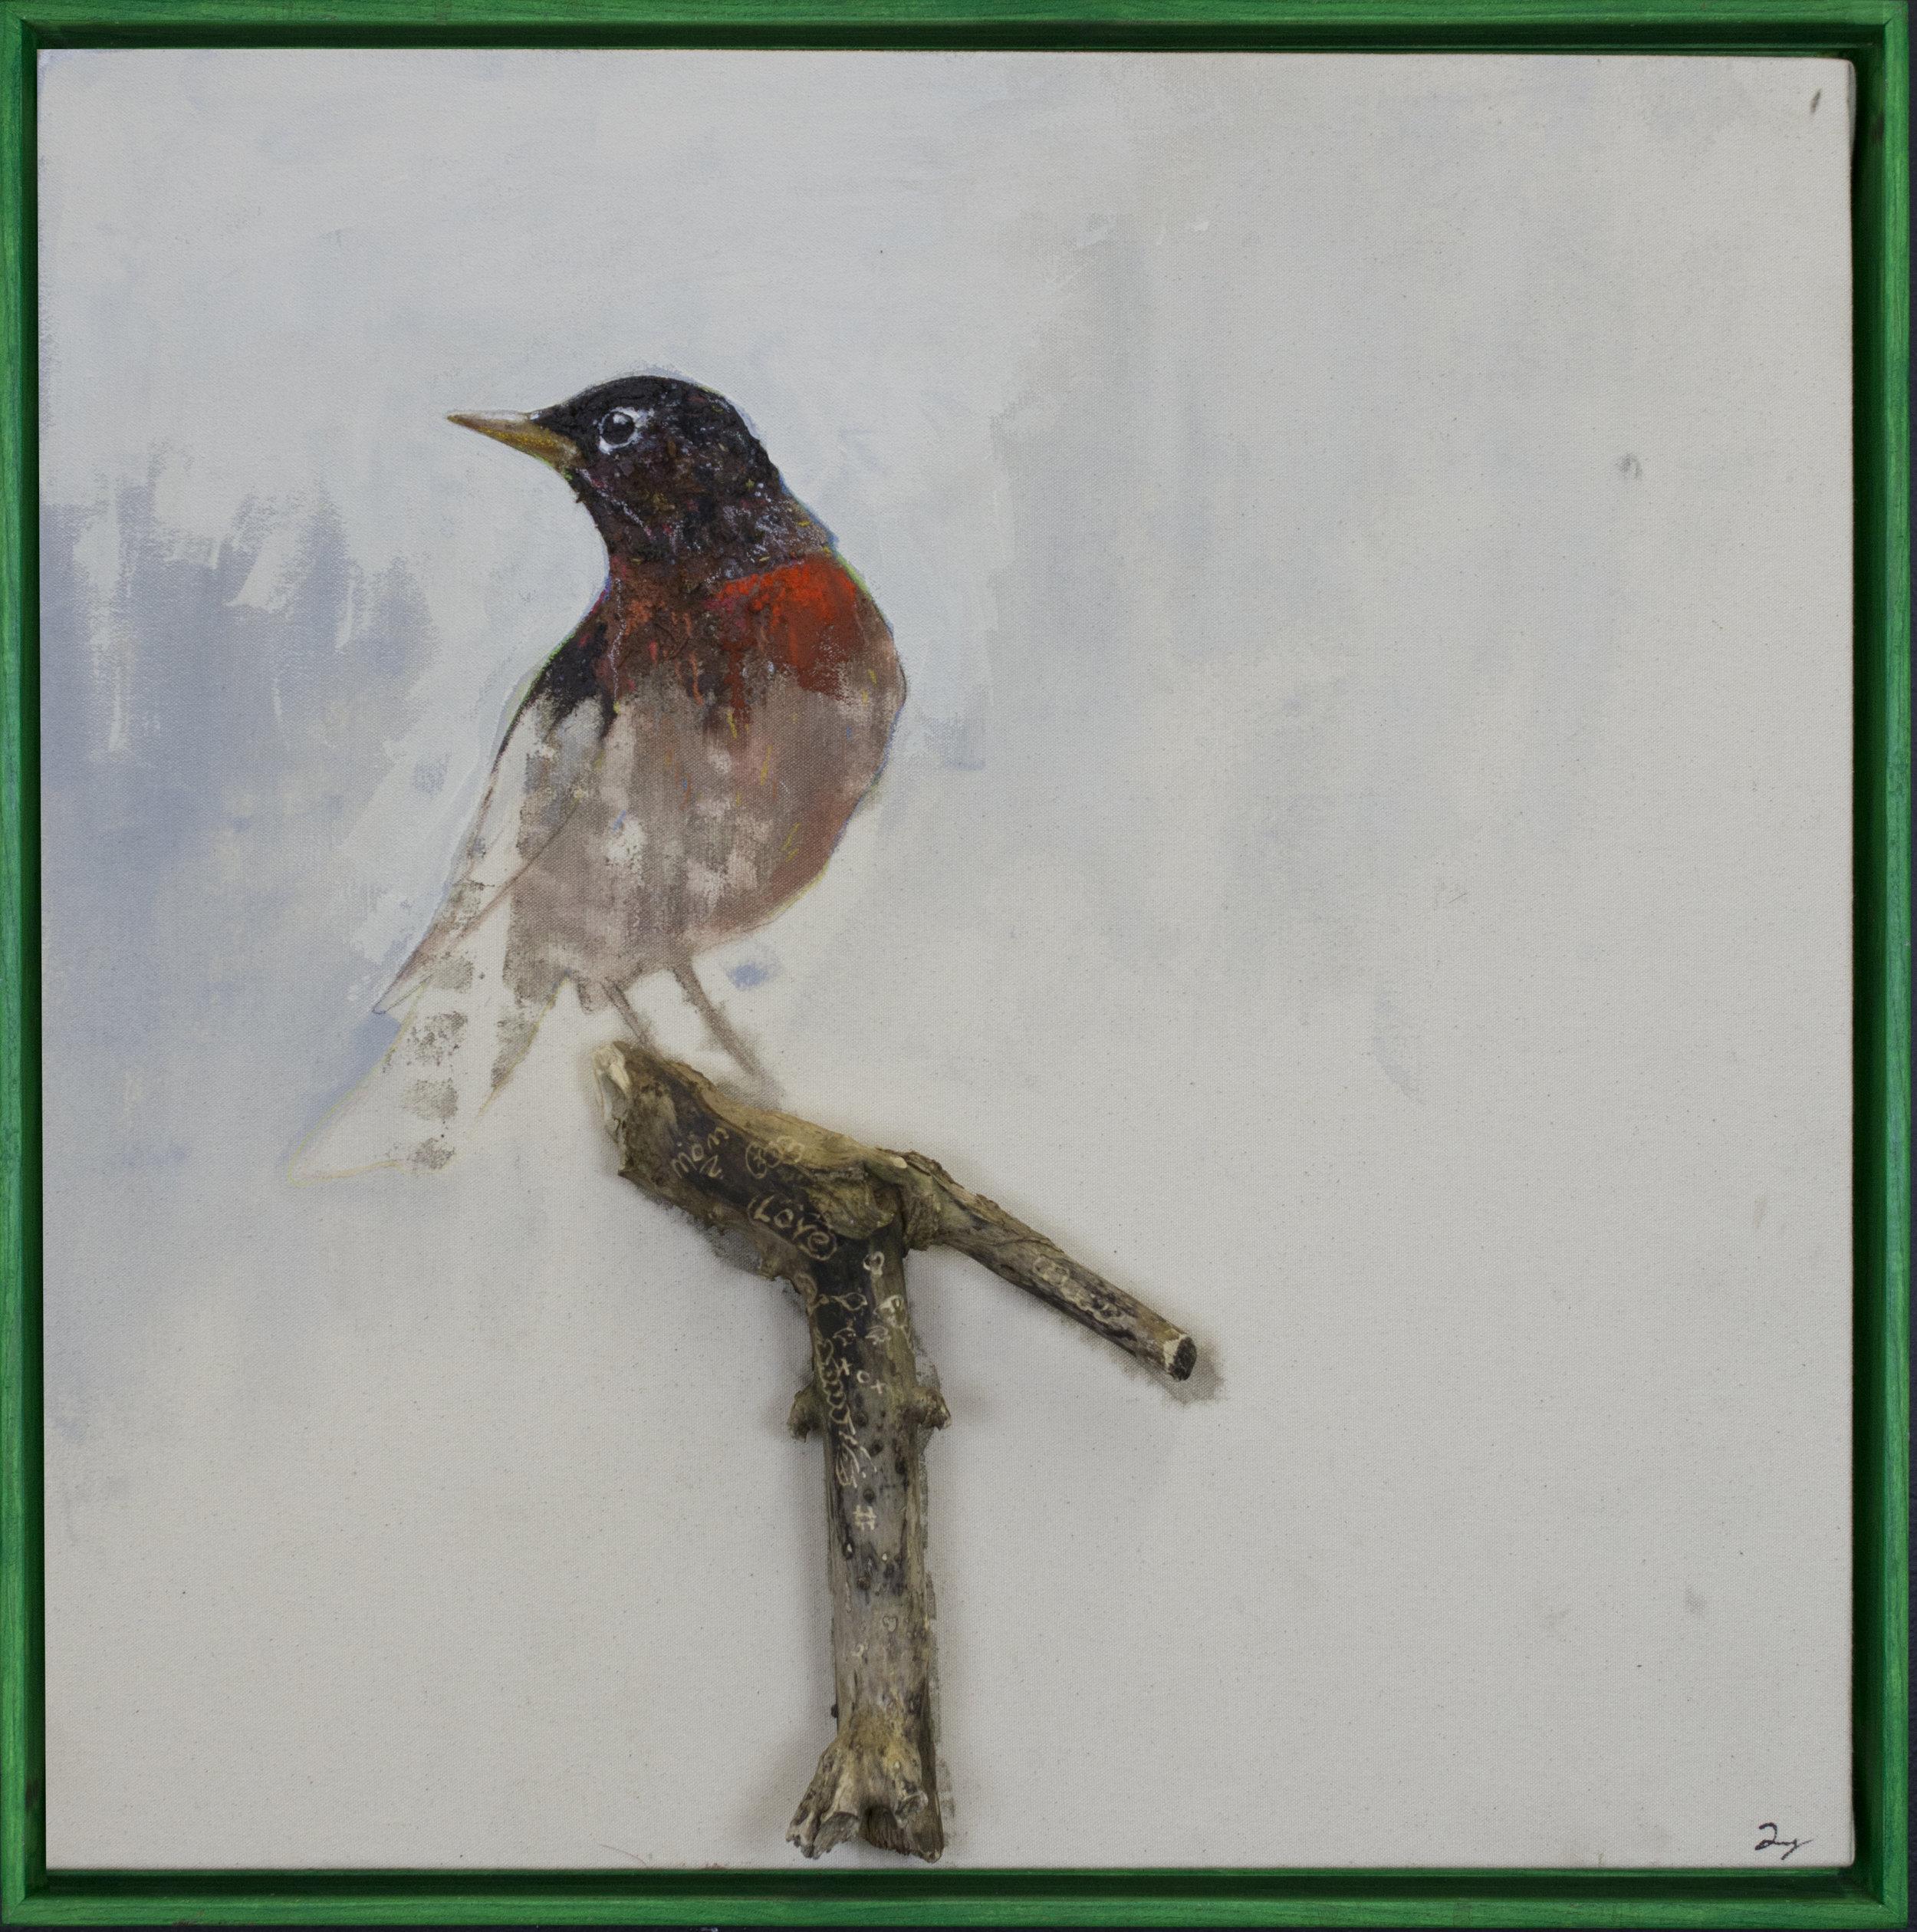 Earth Birds, Robin